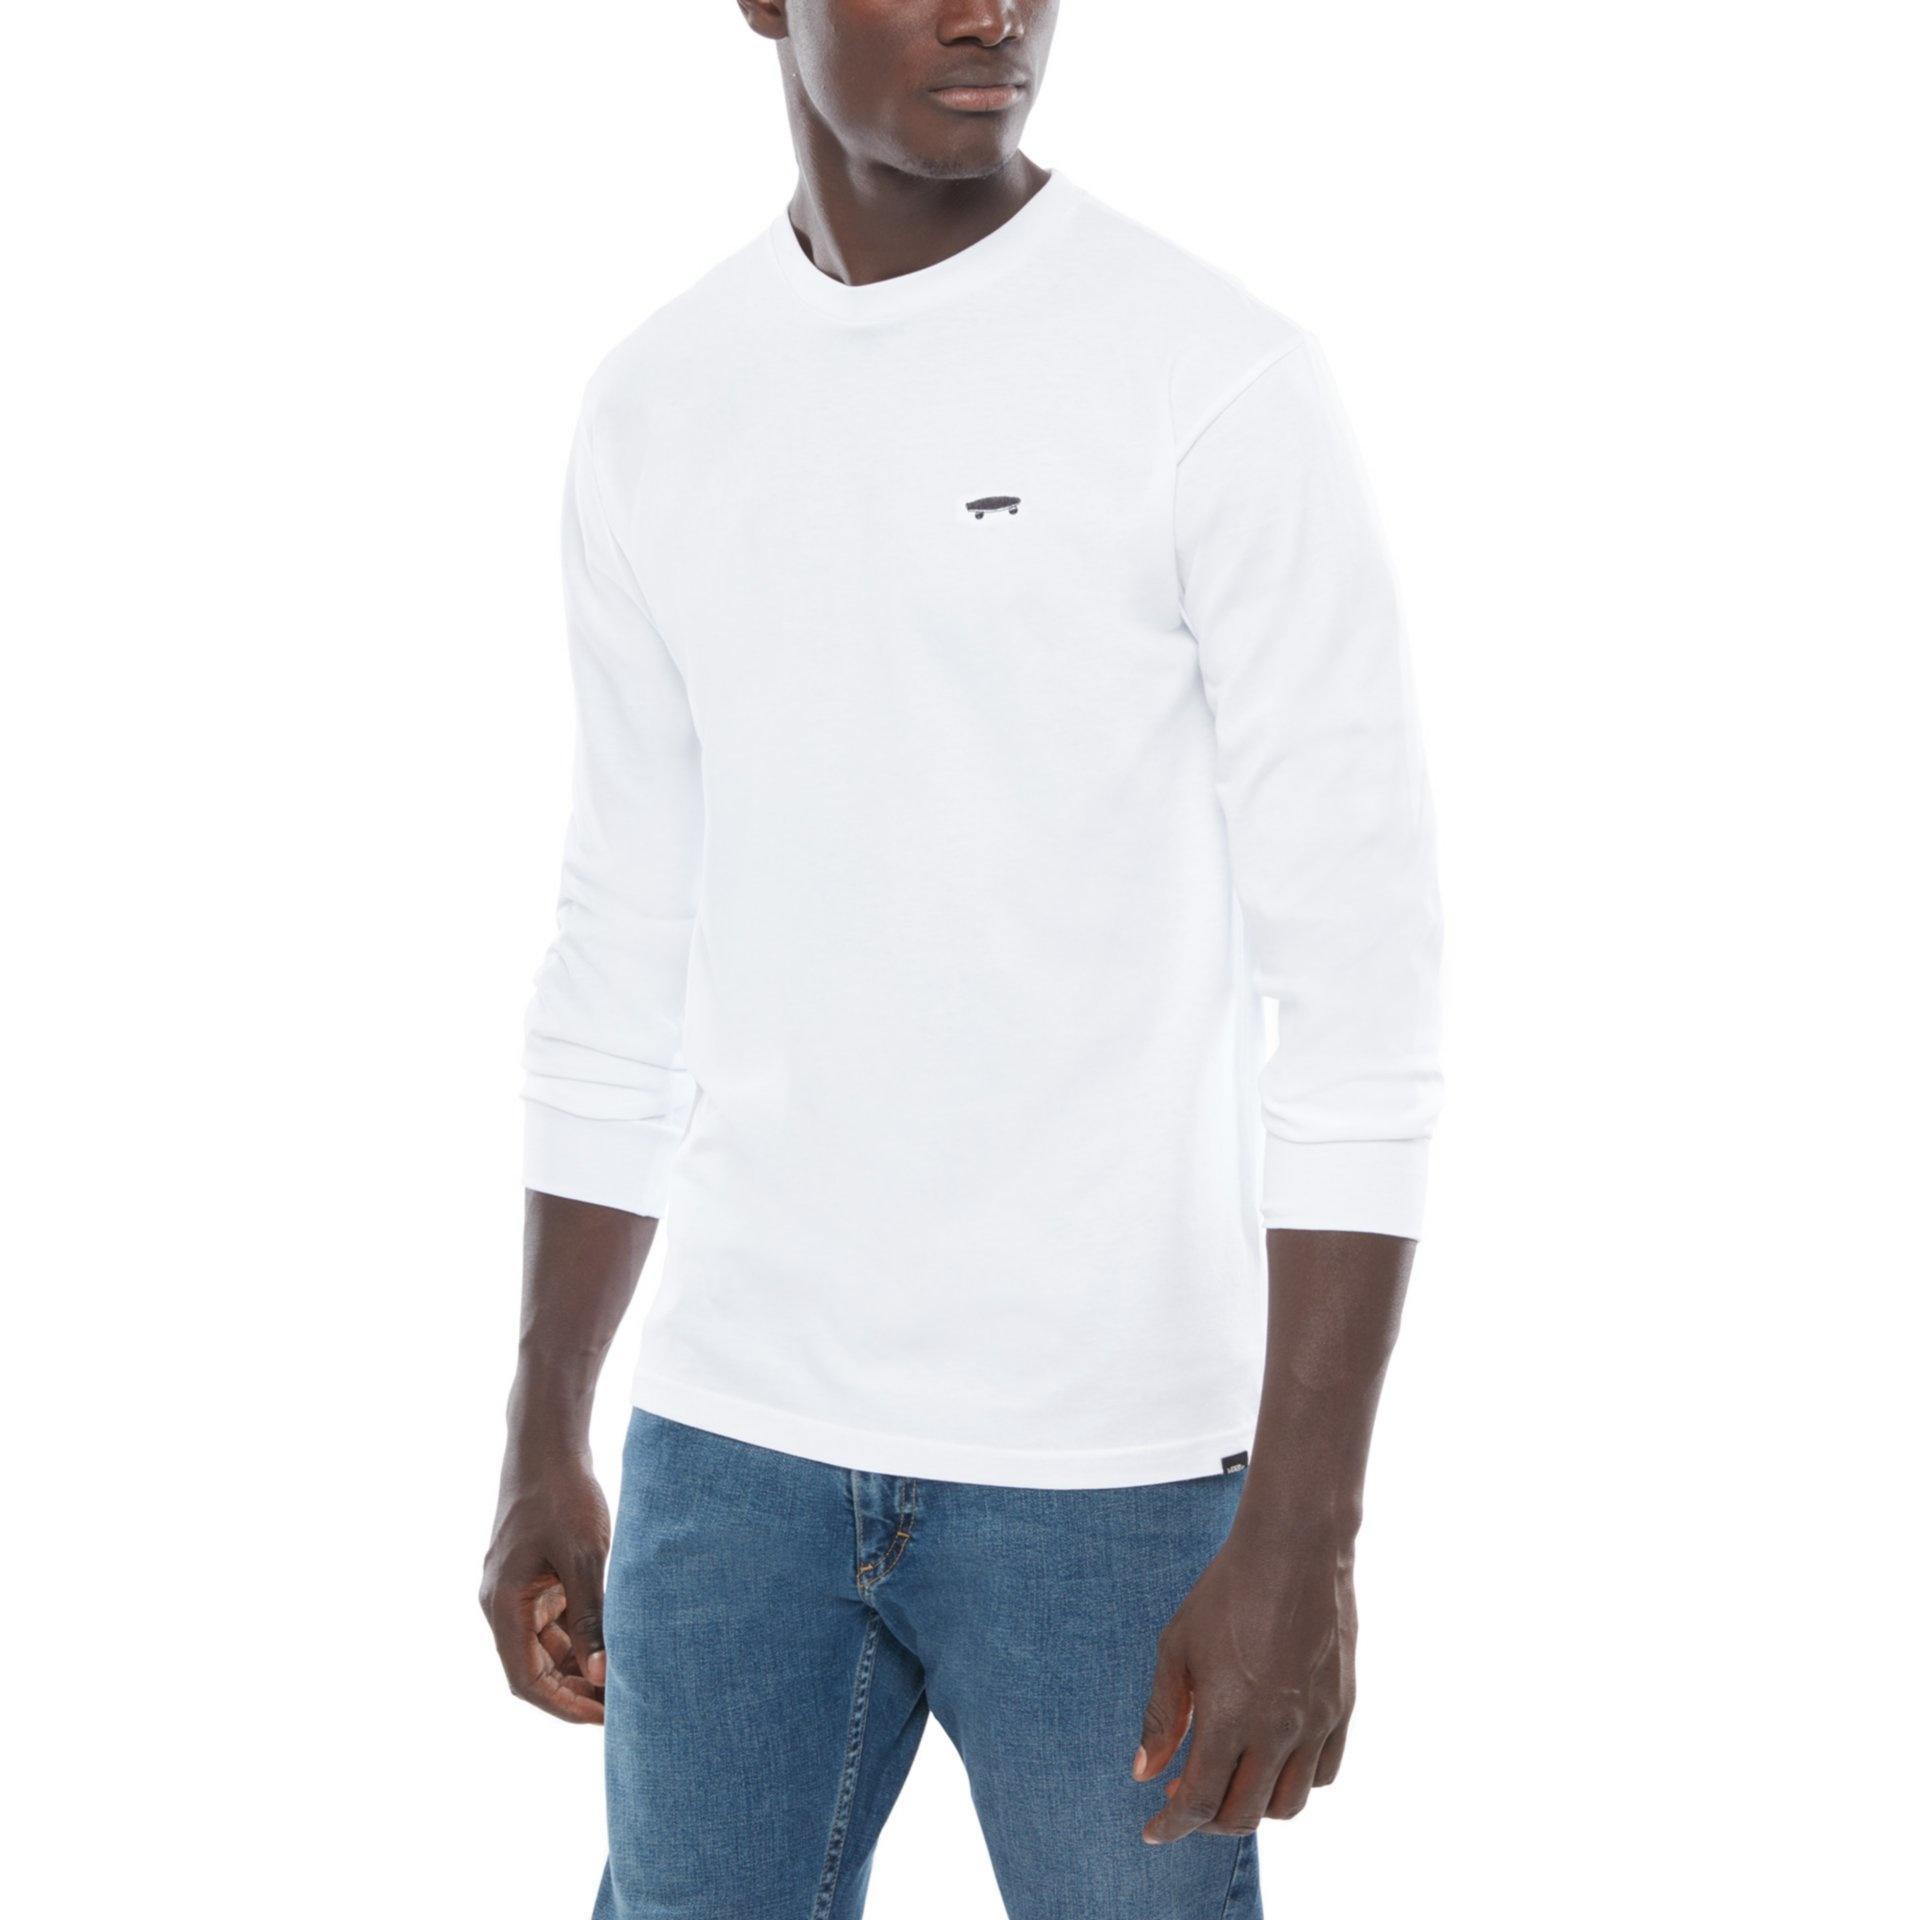 VANS Skate Tee LS White